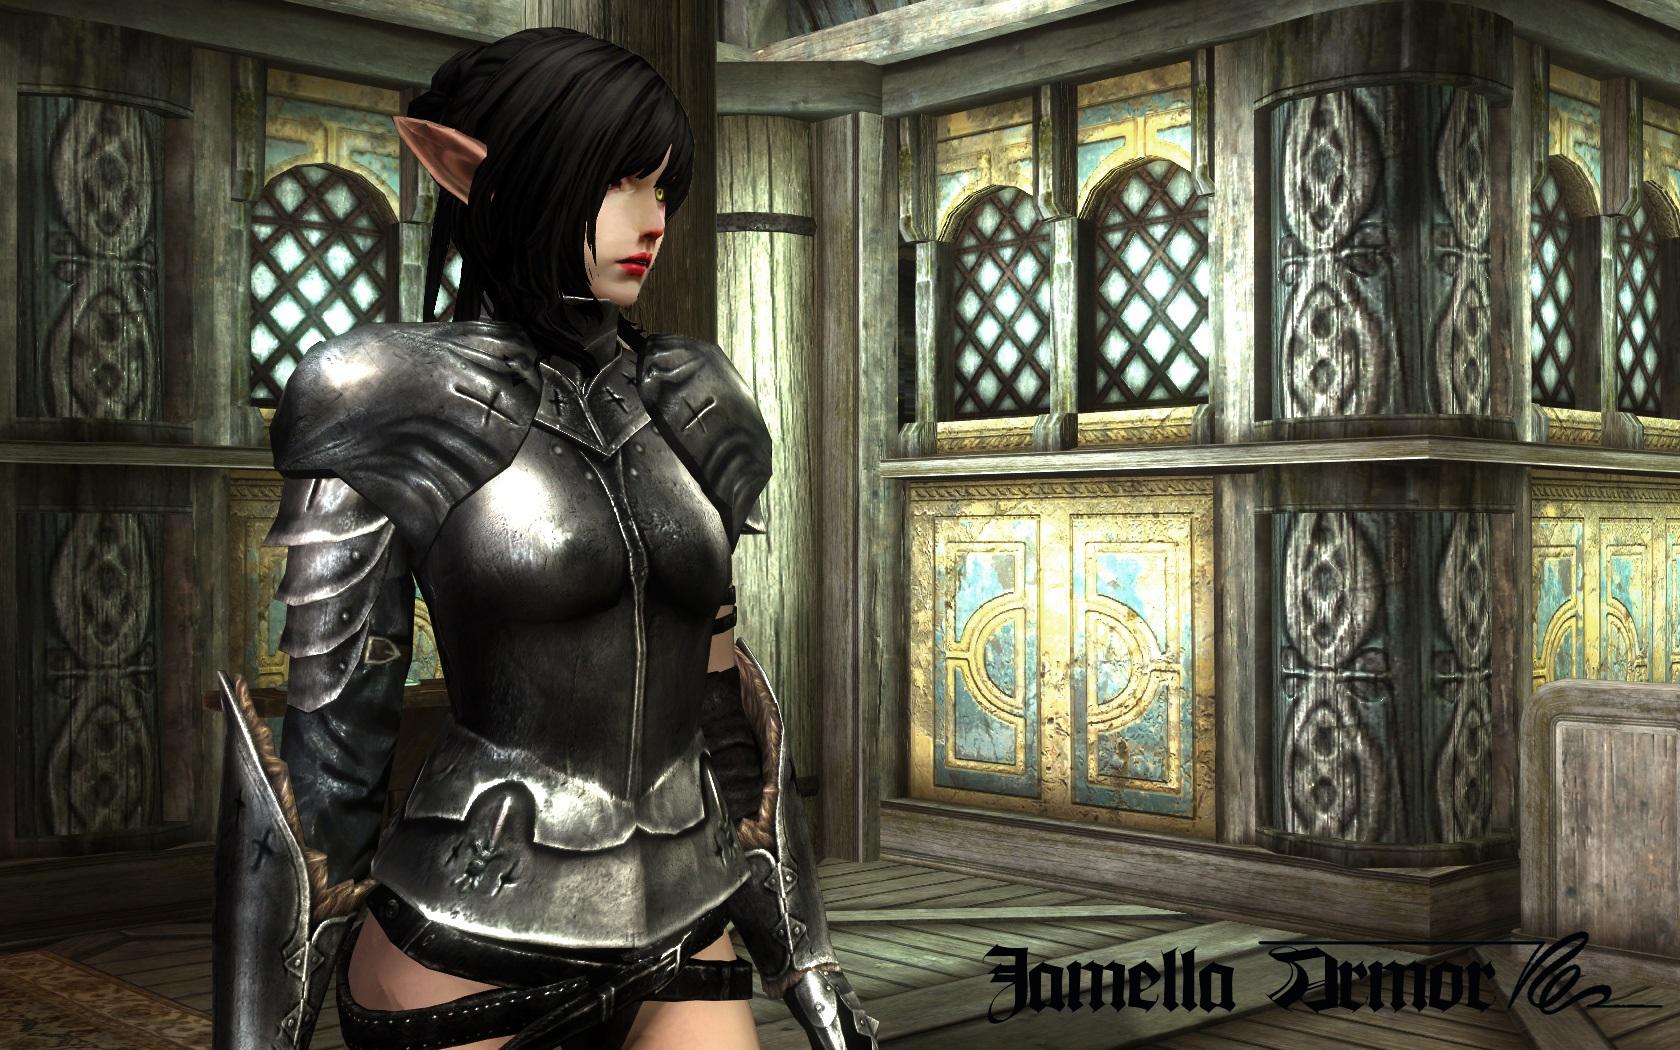 Jamella_Armor_CBBE.jpg